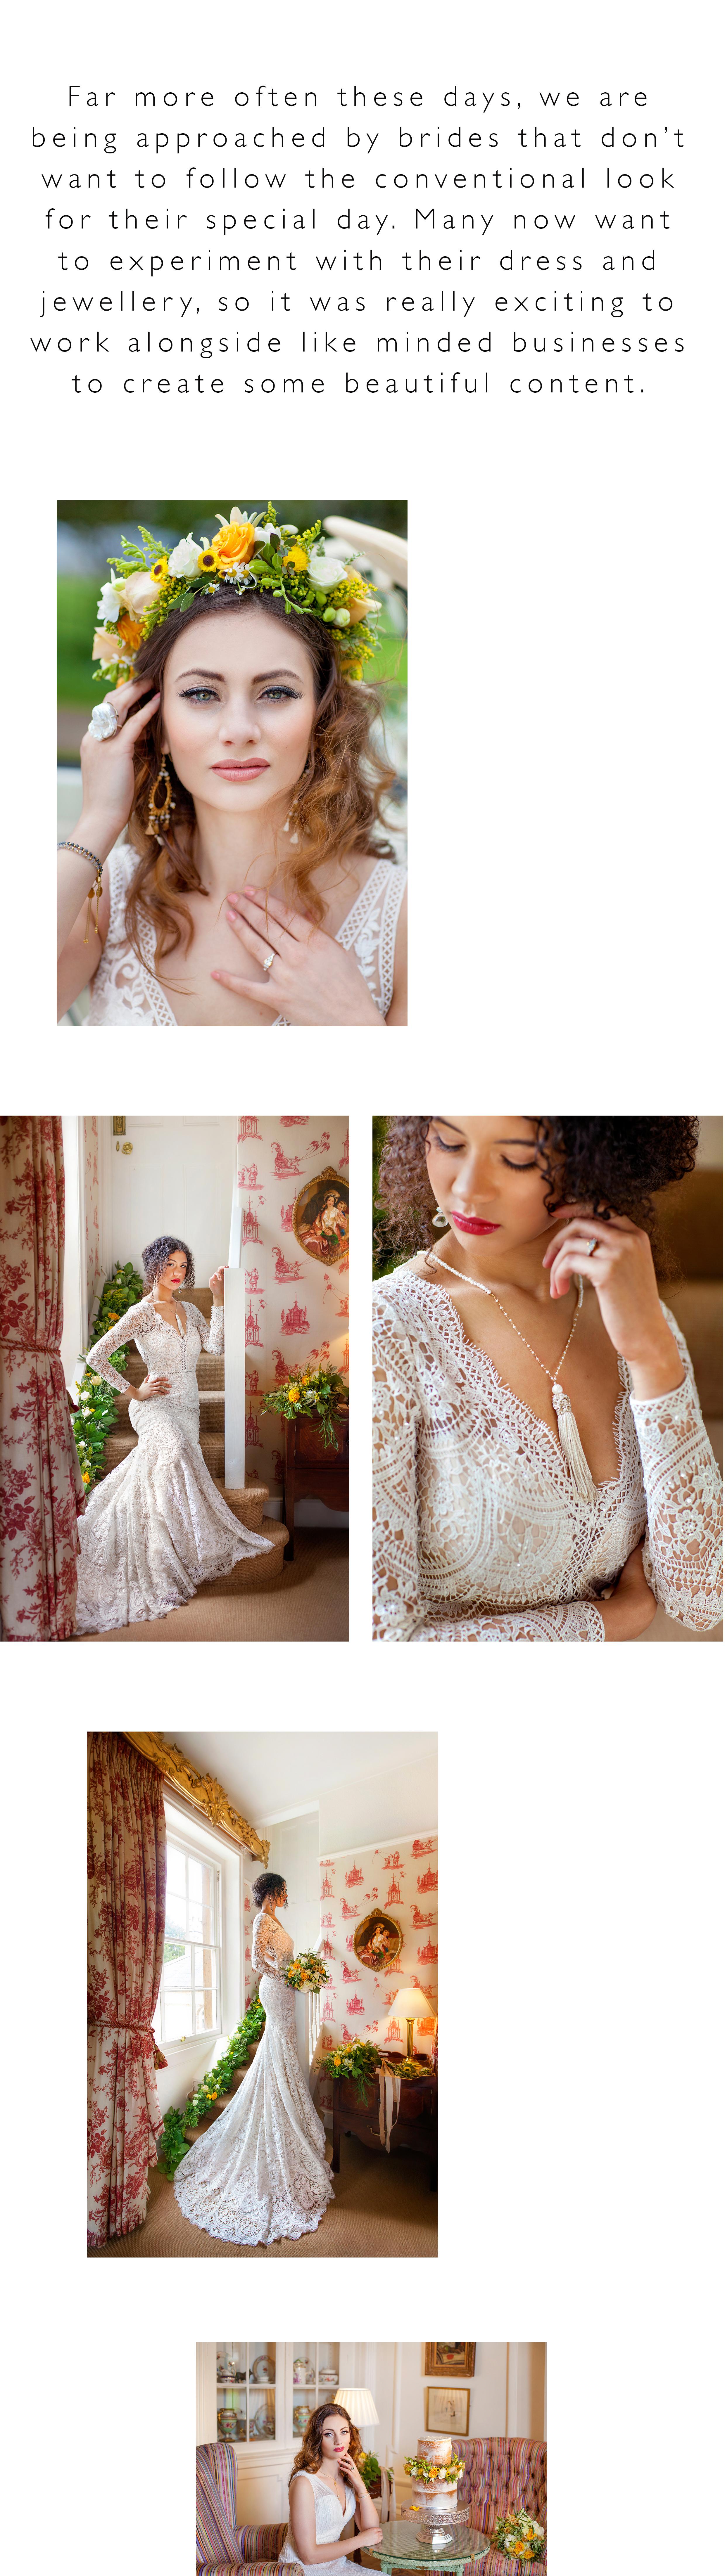 Boho Bride Shoot Page 3.jpg